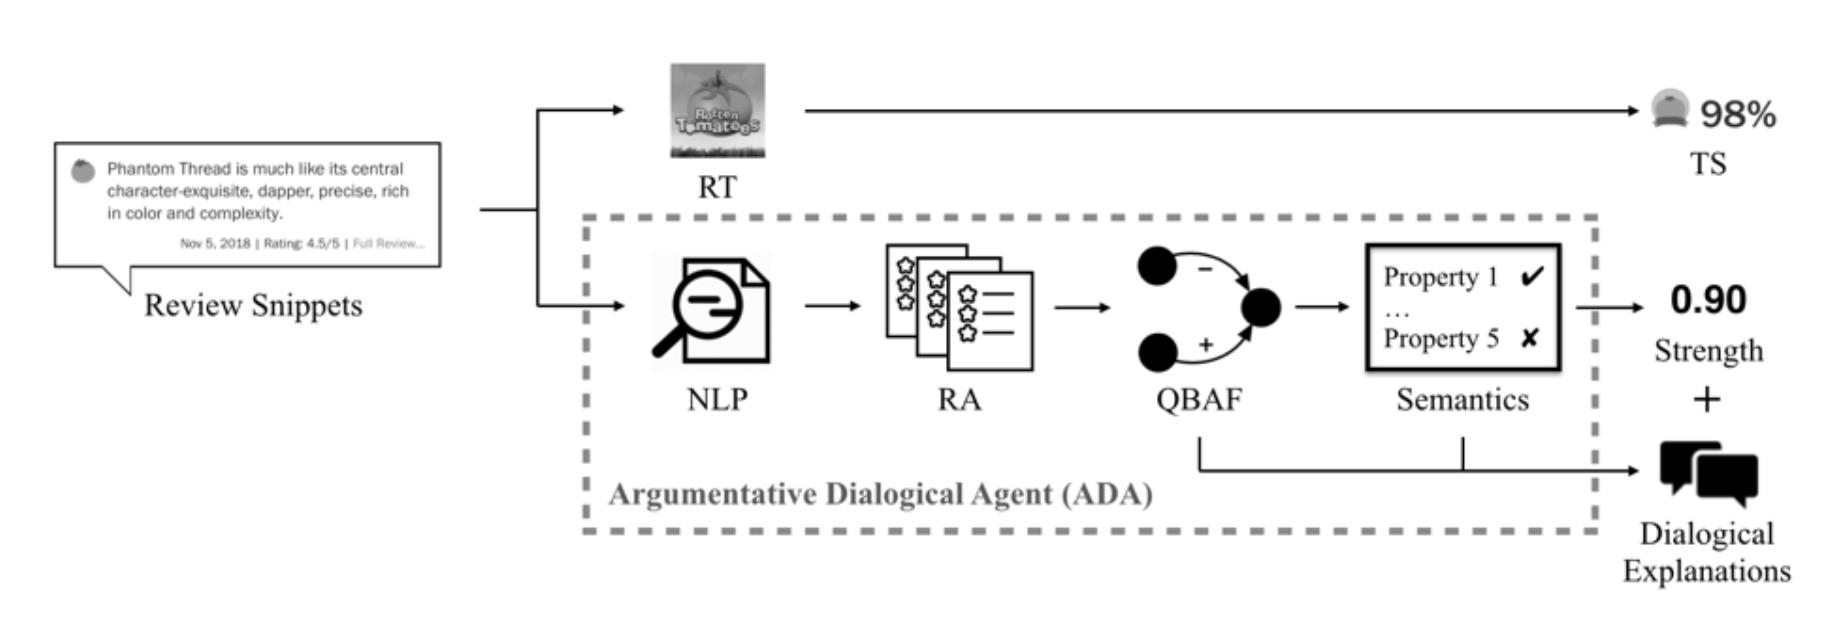 individual_project_interim_report/images/ADA.png